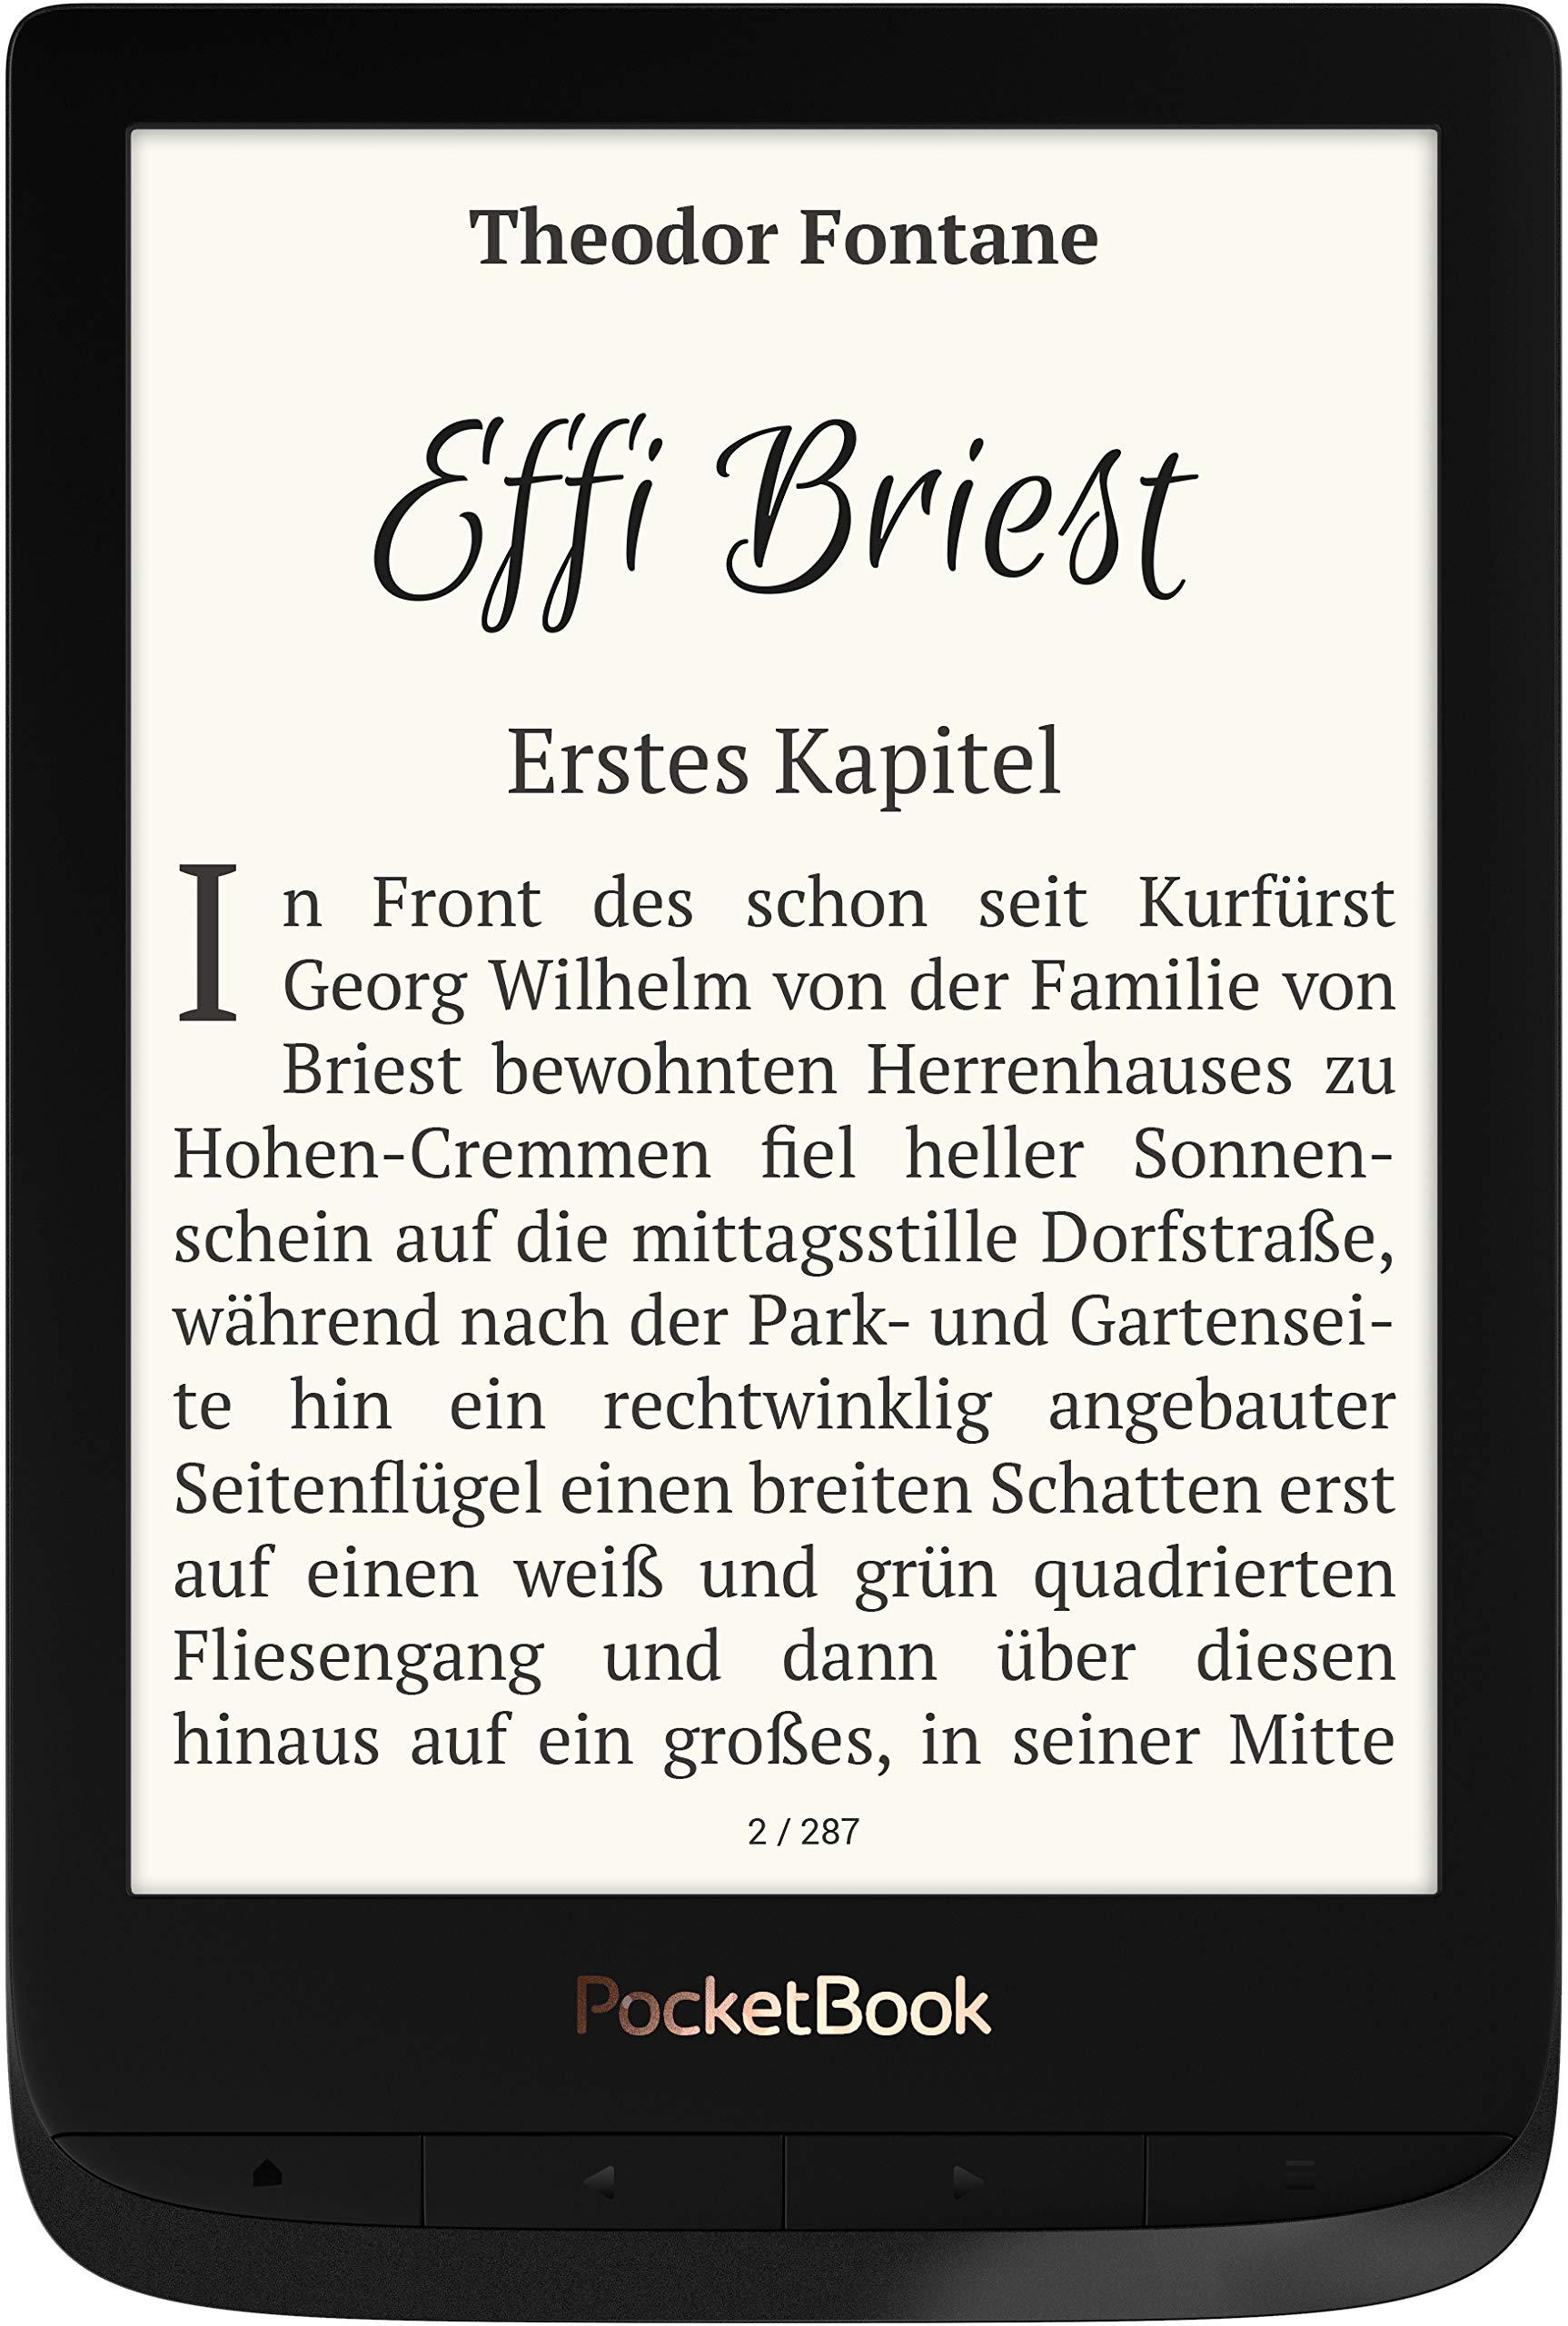 E-Ink Carta Display; SMARTlight; Wi-Fi; Bluetooth 16 GB Memory, 15.24 cm PocketBook e-Book Reader Touch HD 3 in Copper 6 Inch